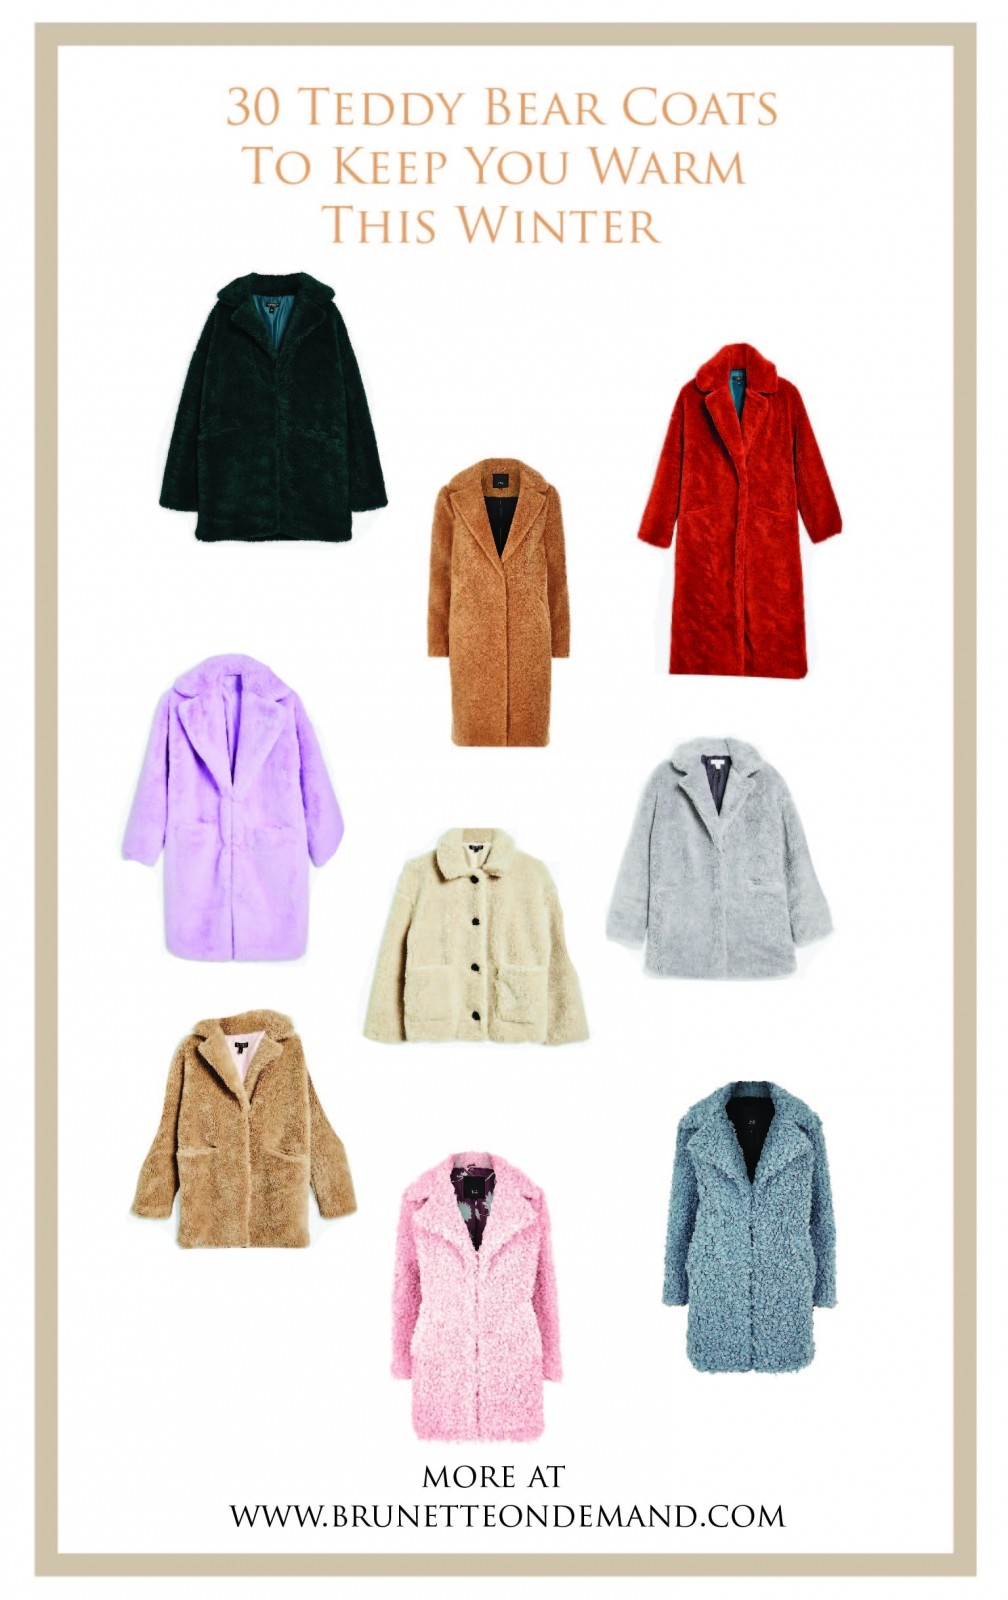 30 Teddy Bear Coats To Keep You Warm This Winter - Brondema